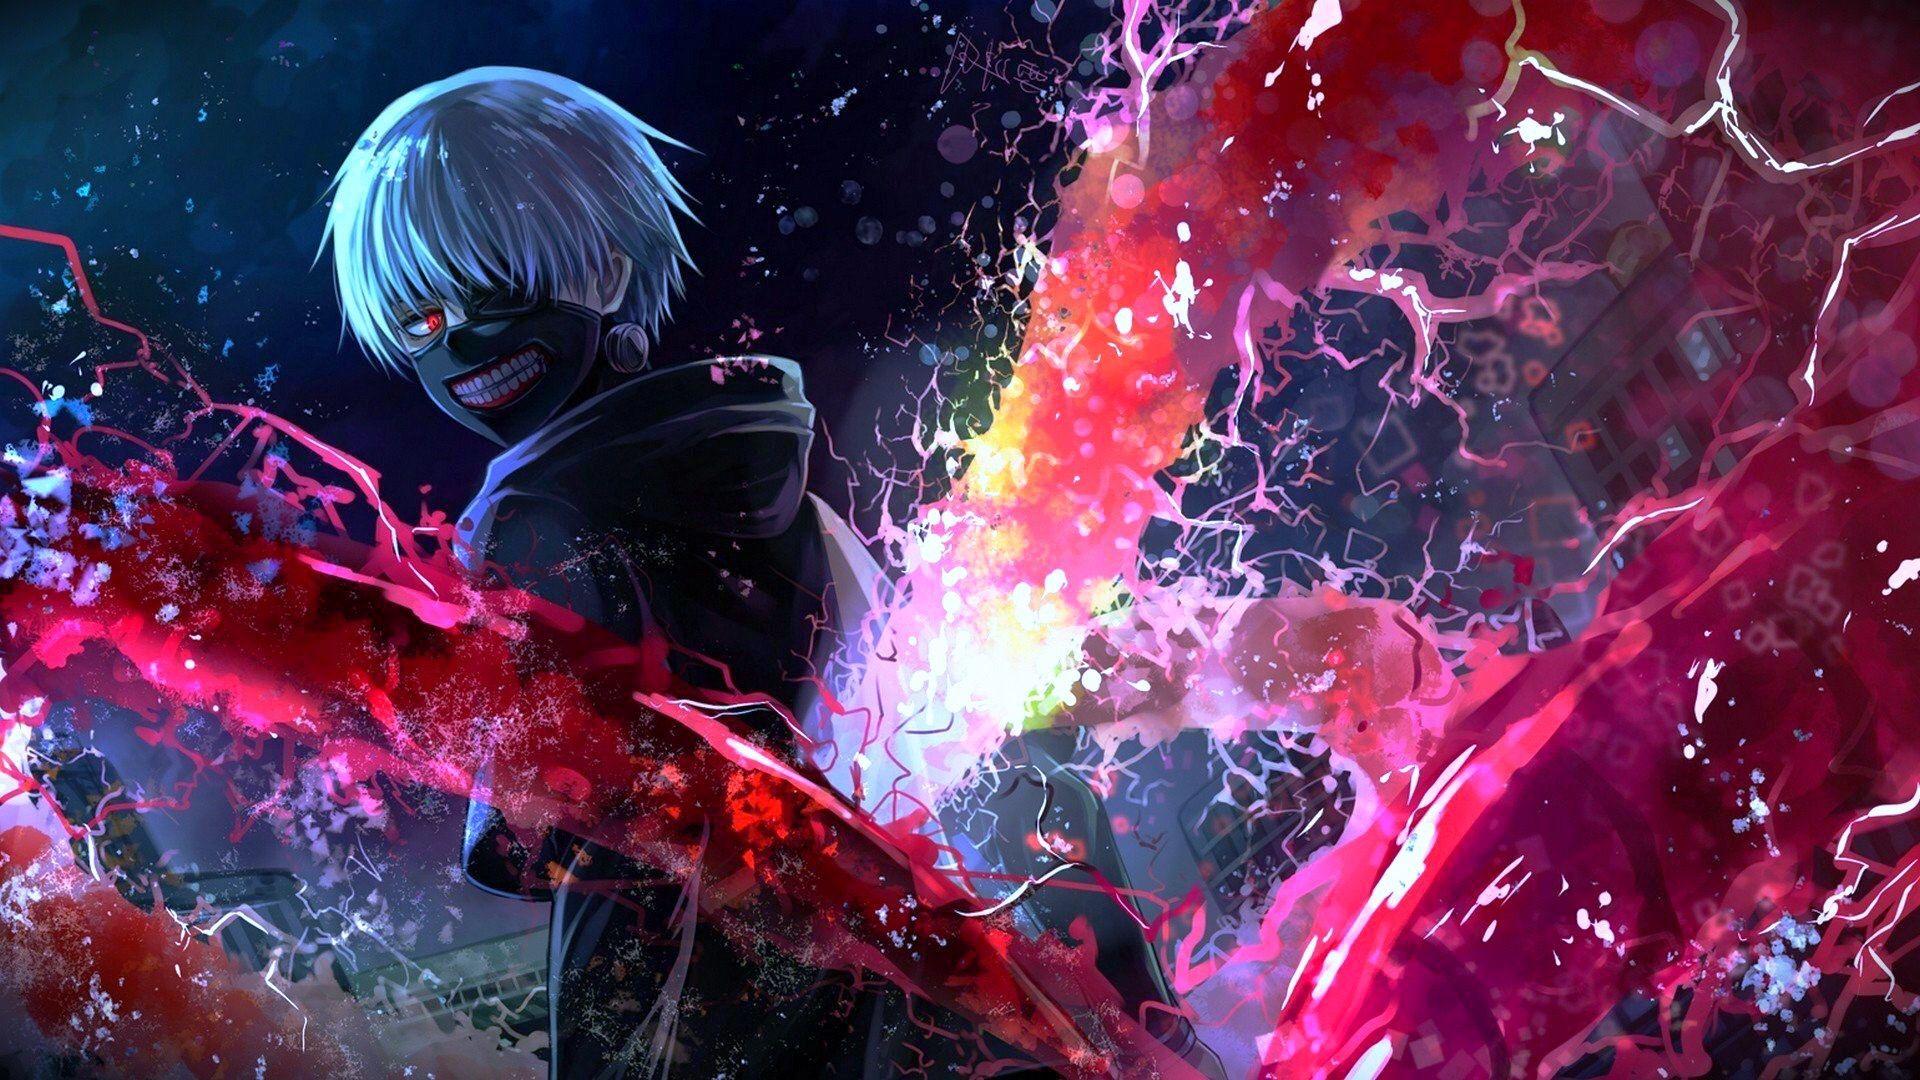 Unduh 98 Koleksi Wallpaper Anime Blood Hd HD Terbaru